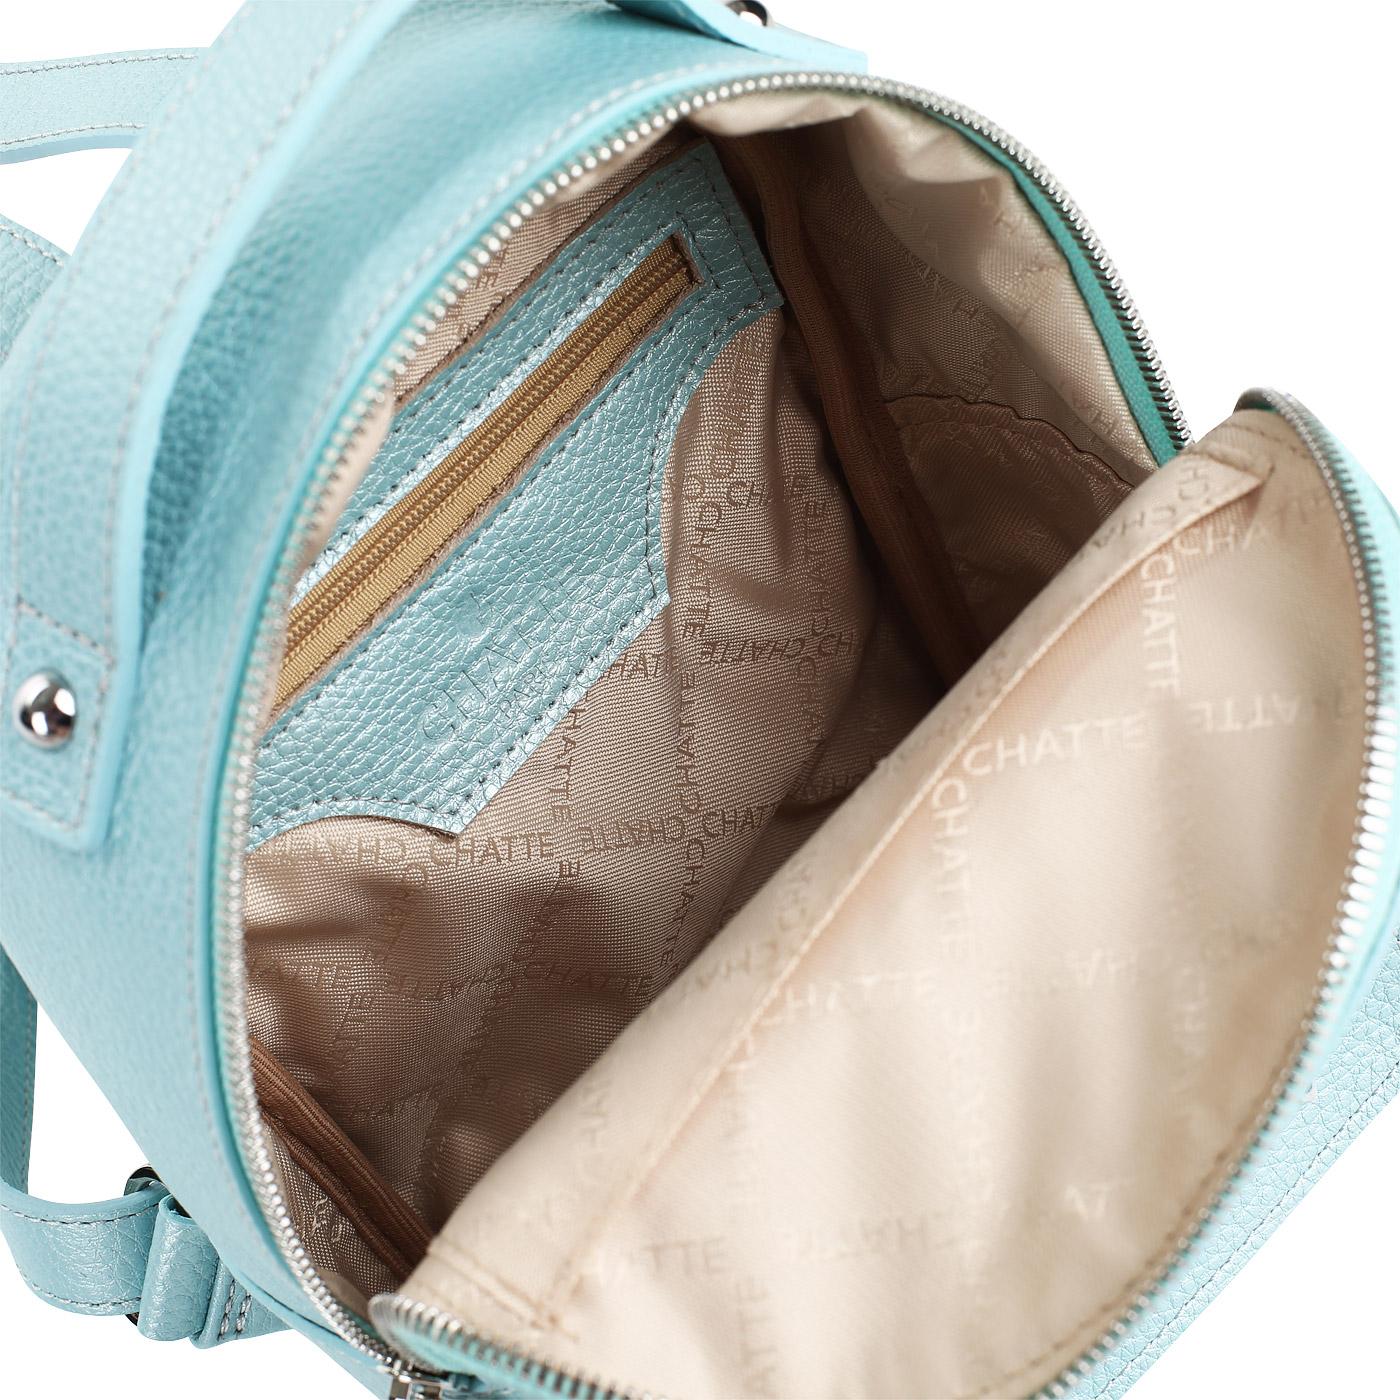 2820ab7ced17 Маленький кожаный рюкзак с аппликацией Chatte DB9225_light blue ...